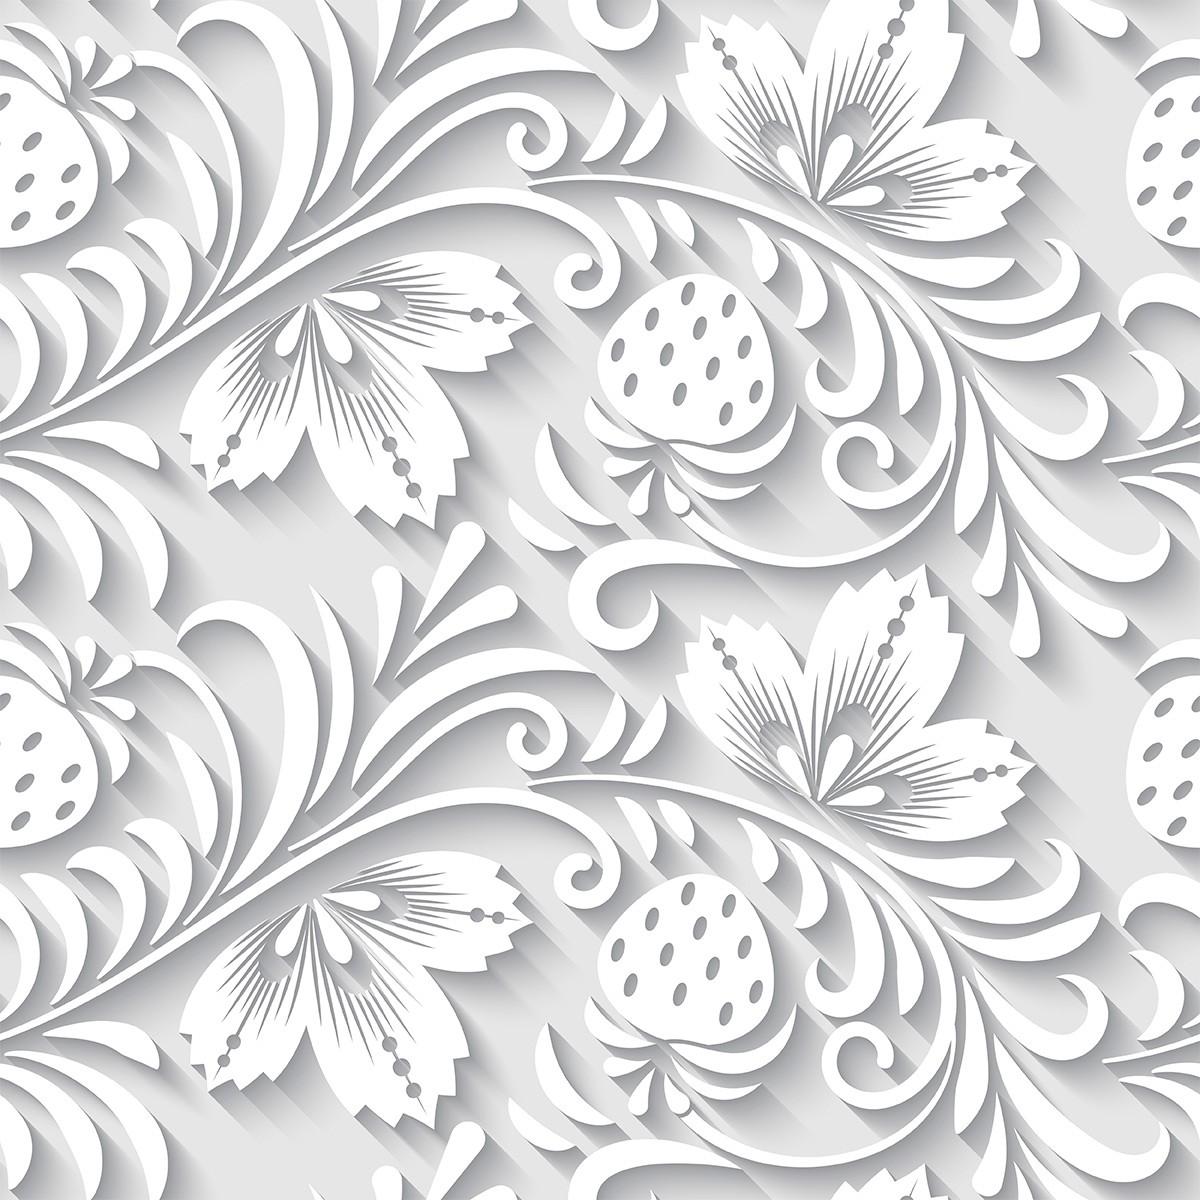 Papel de Parede 3D Floral Frutas Morango Tropical Adesivo